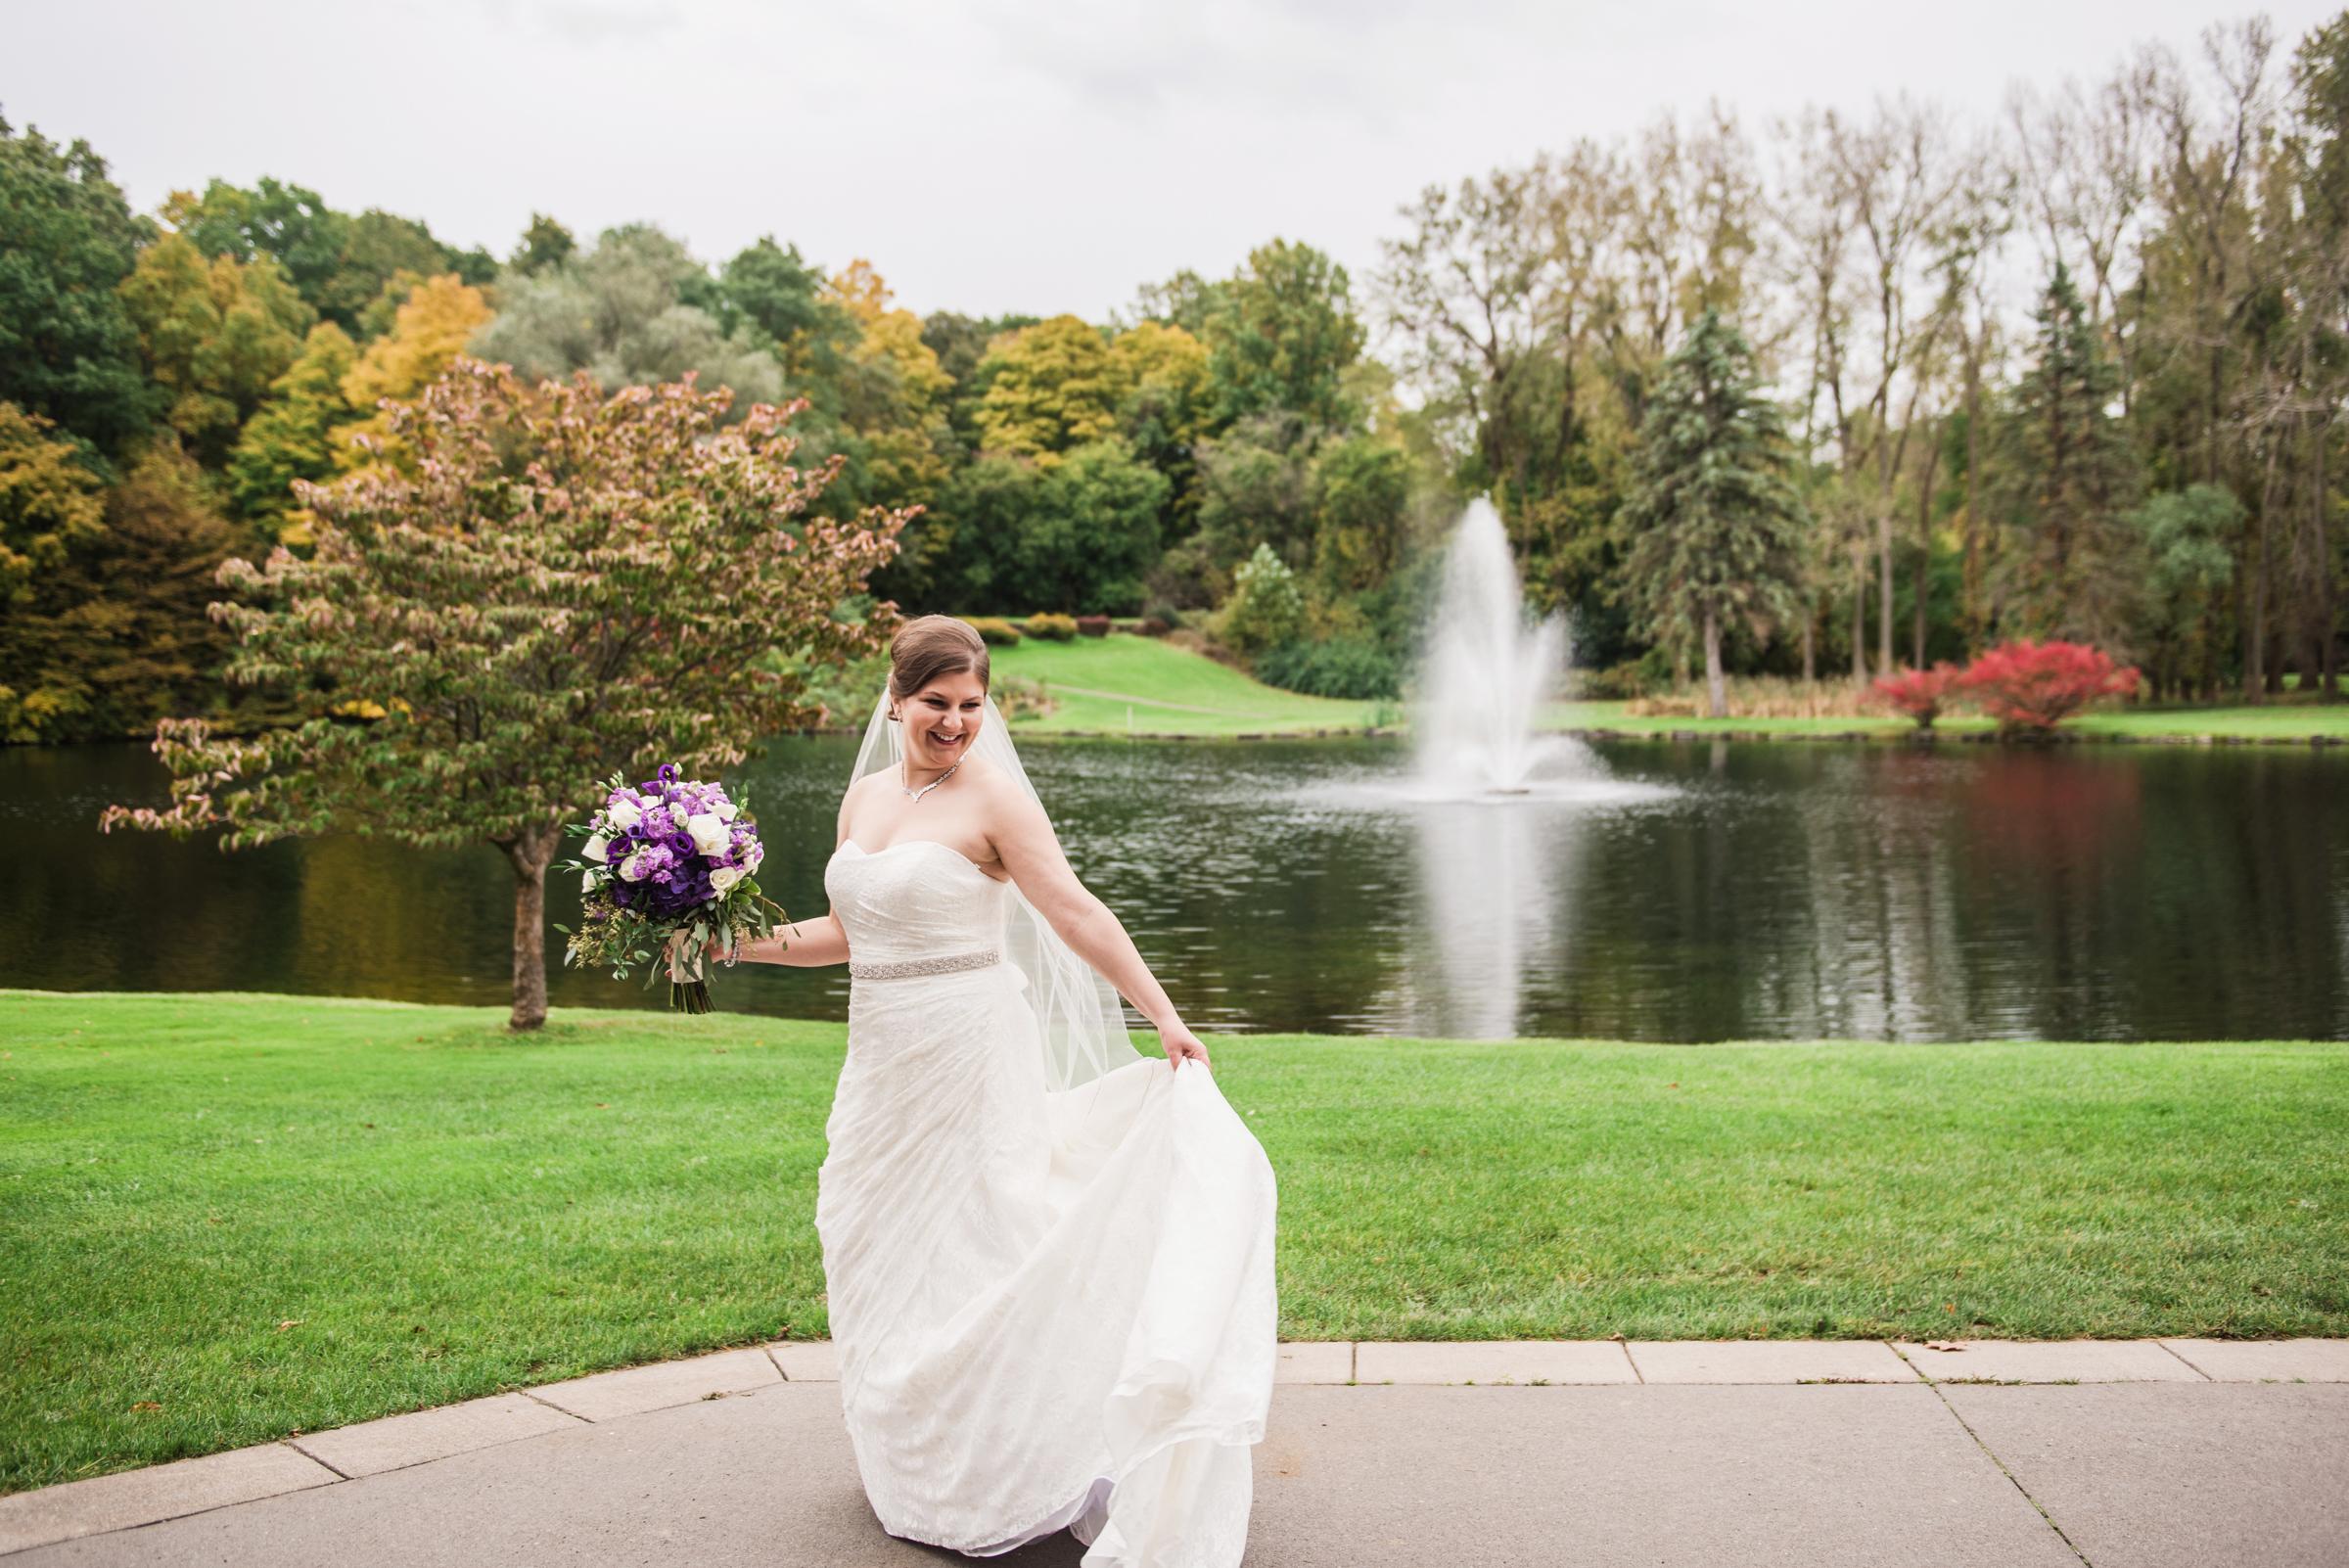 Shadow_Lake_Rochester_Wedding_JILL_STUDIO_Rochester_NY_Photographer_DSC_5657.jpg